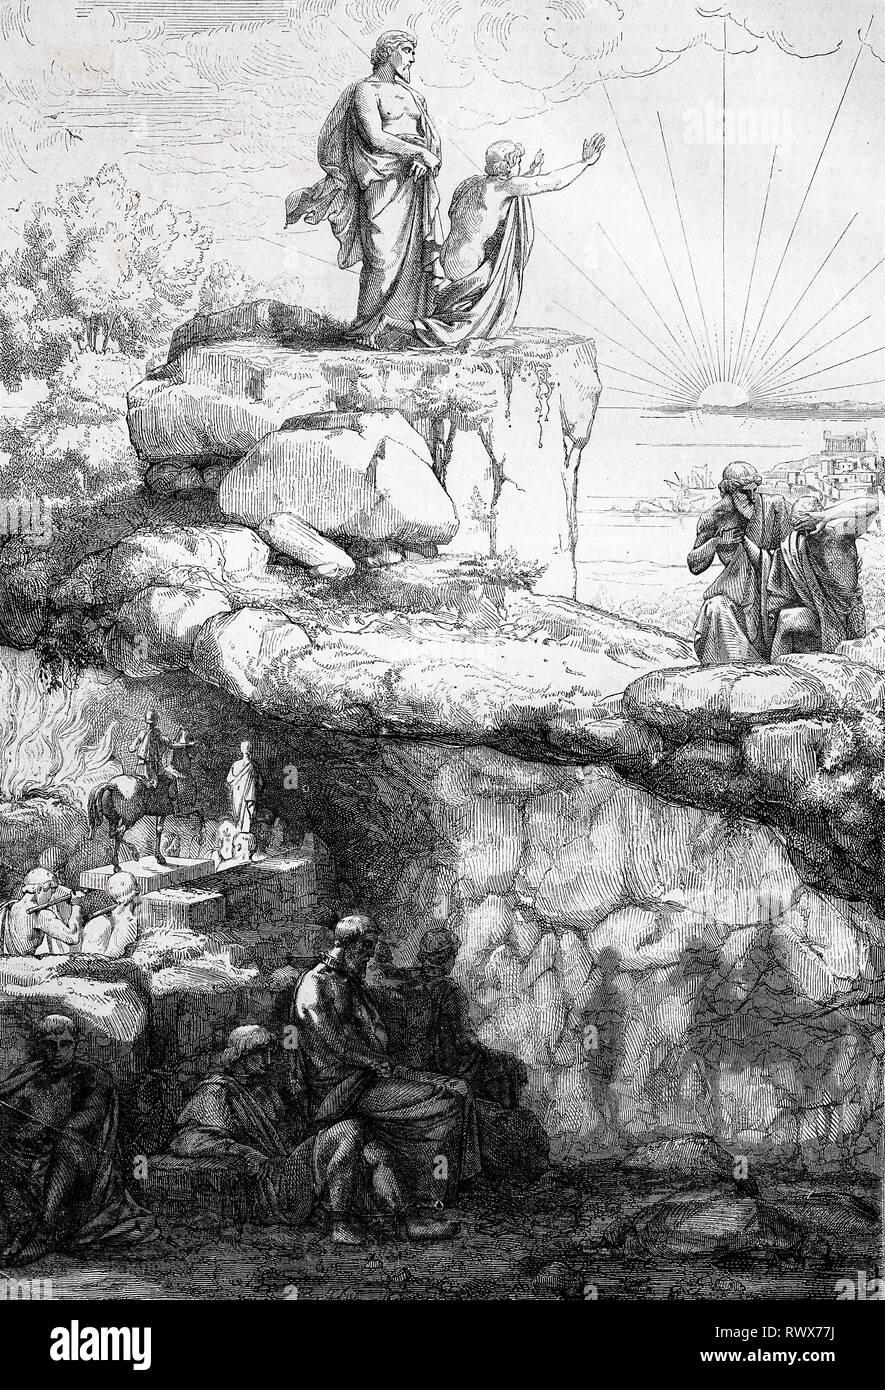 Platons Hoehle, Allegorie auf das Hoehlengleichnis von Platon, antike Philosophie  /  Plato's cave, allegory of Plato's allegory of the cave, ancient philosophy - Stock Image